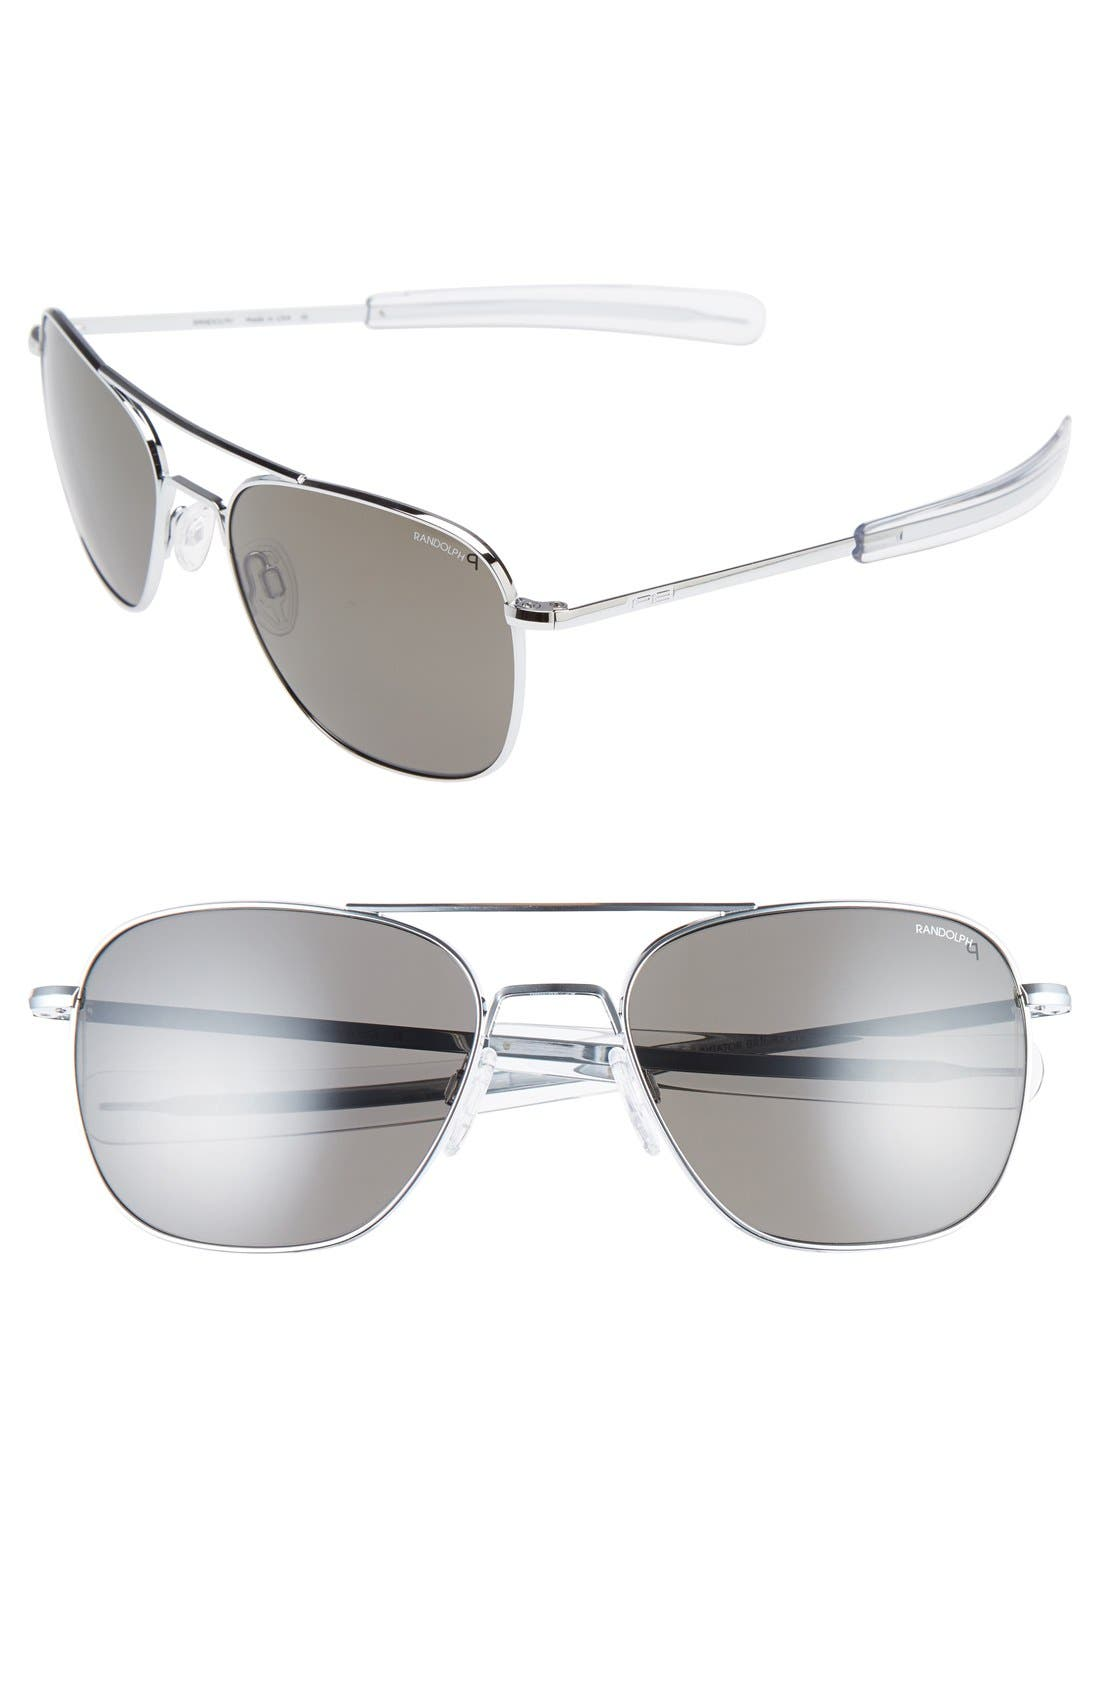 58mm Polarized Aviator Sunglasses,                         Main,                         color, Bright Chrome